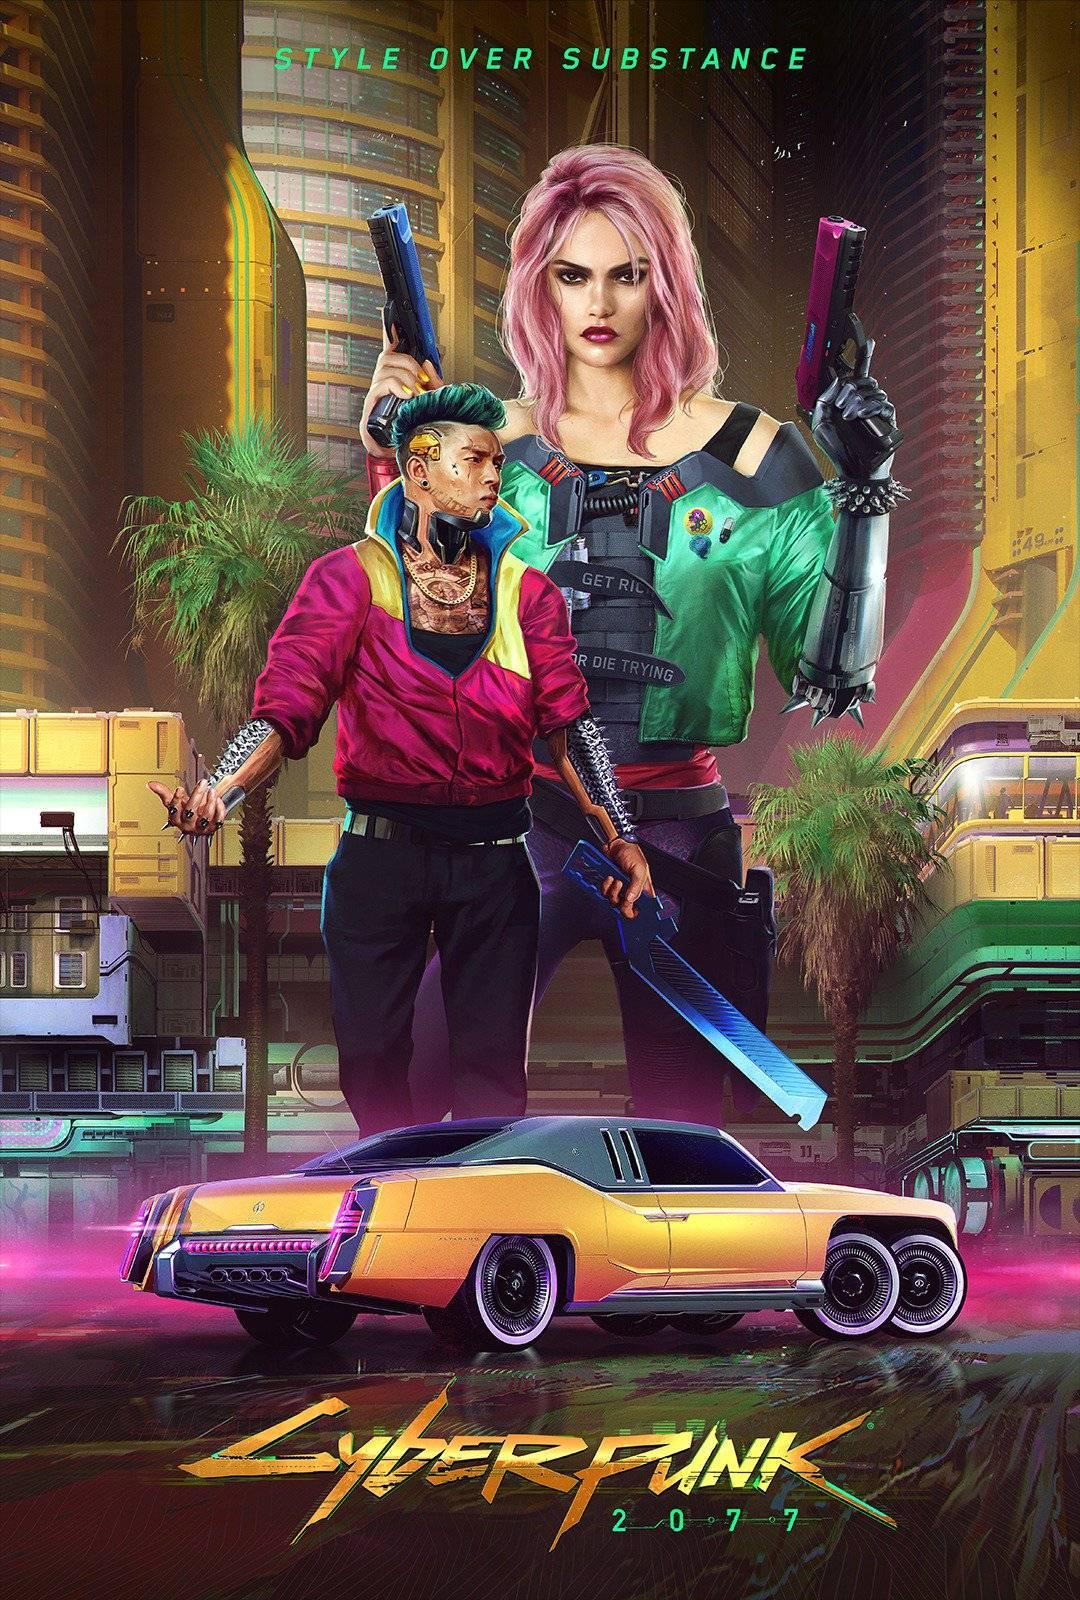 Стили Cyberpunk 2077 в одежде и архитектуре 2